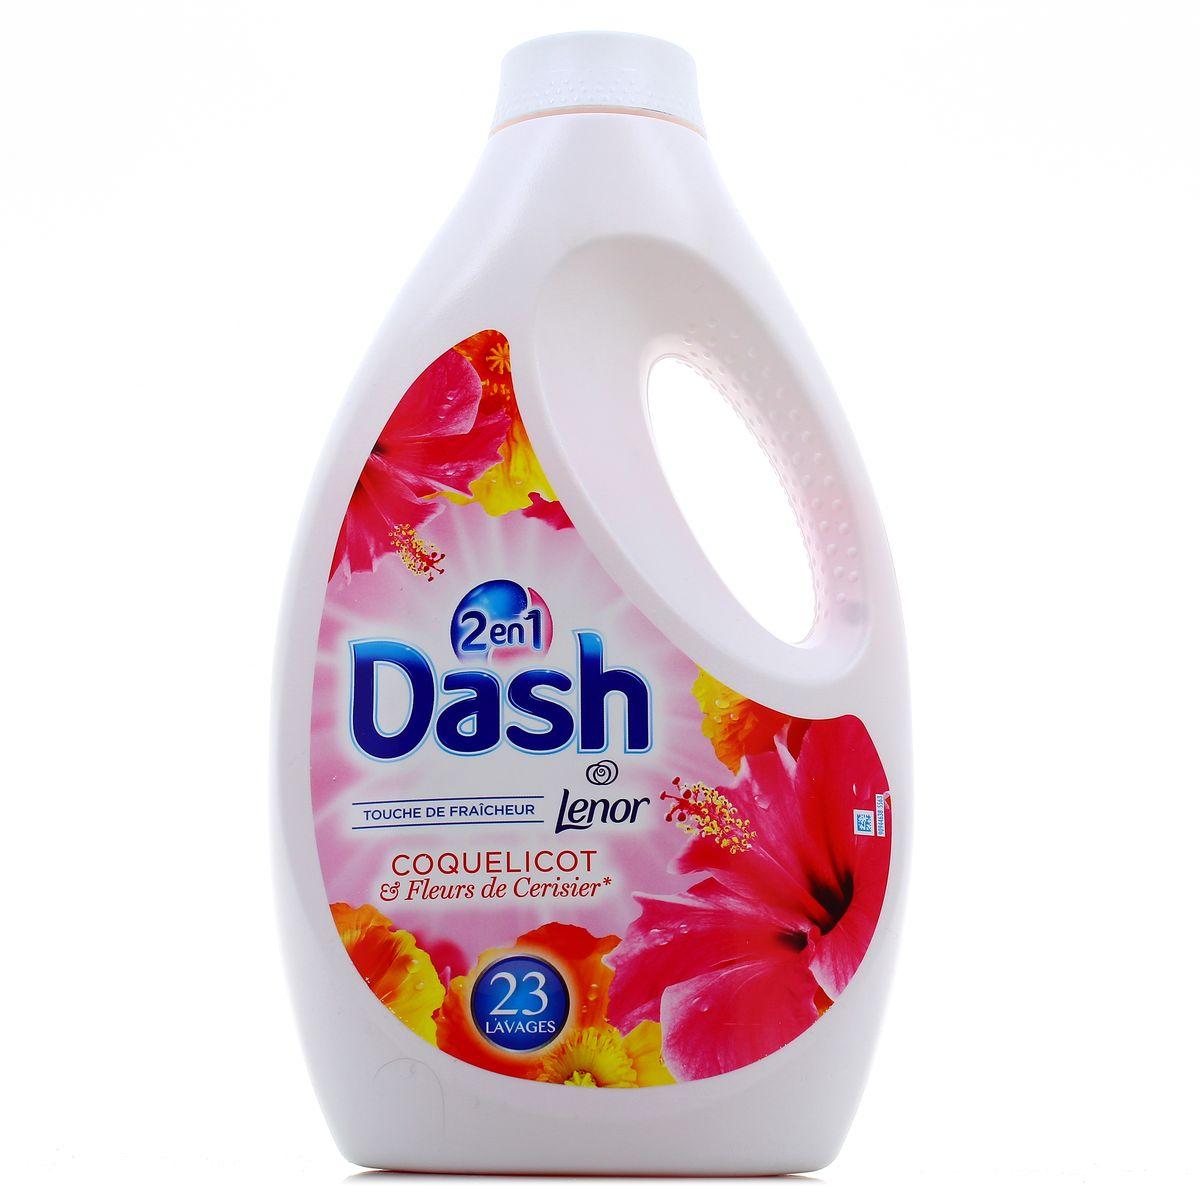 Lessive liquide coquelicot/cerisier 23 doses, Dash (1.265 L)